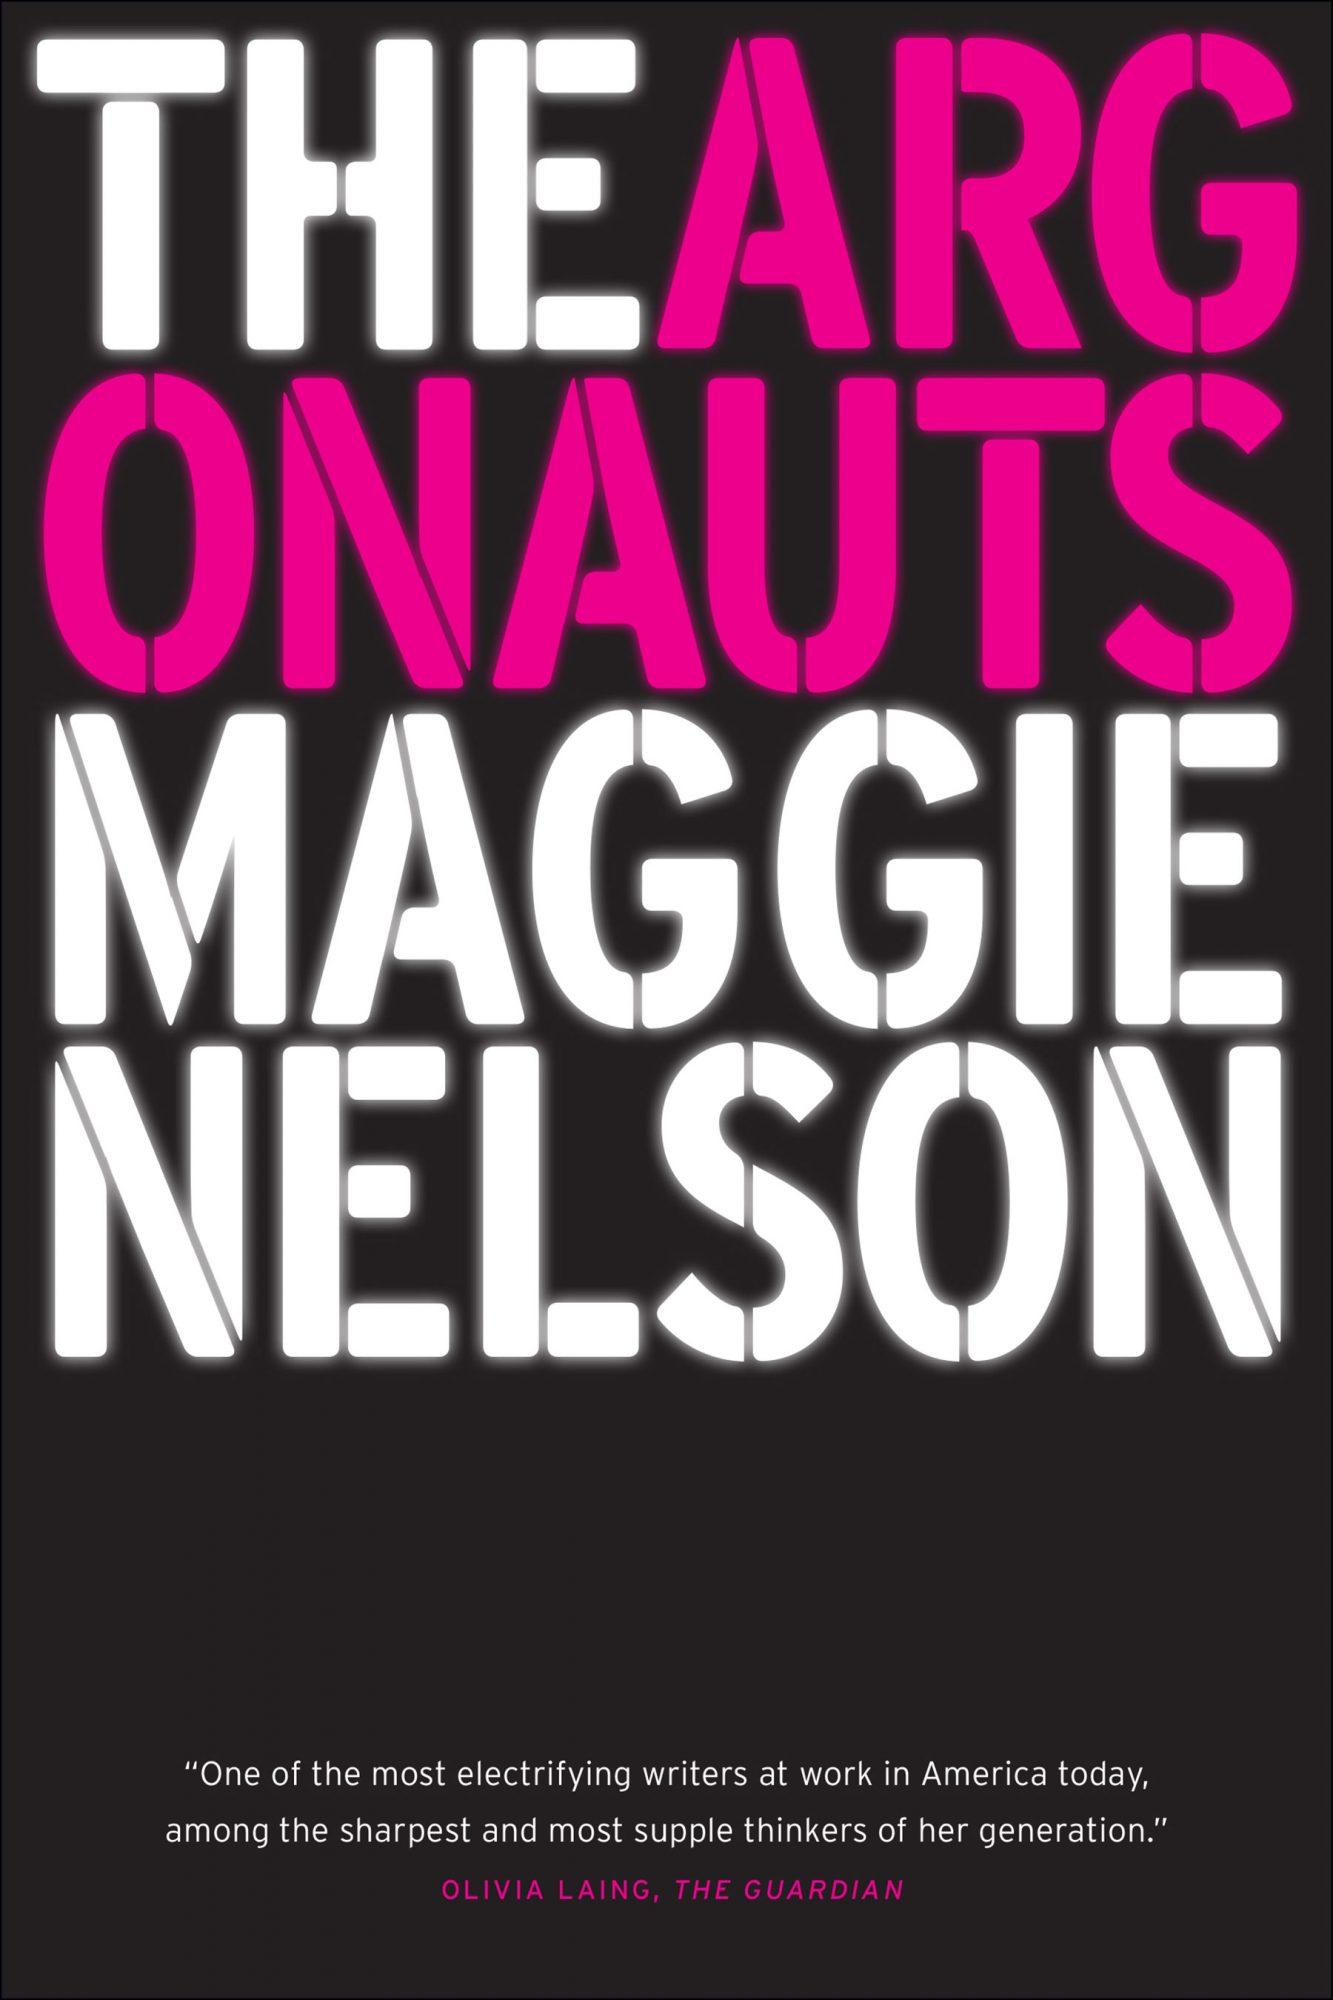 The Argonauts (1/26/16) - paperbackby Maggie Nelson